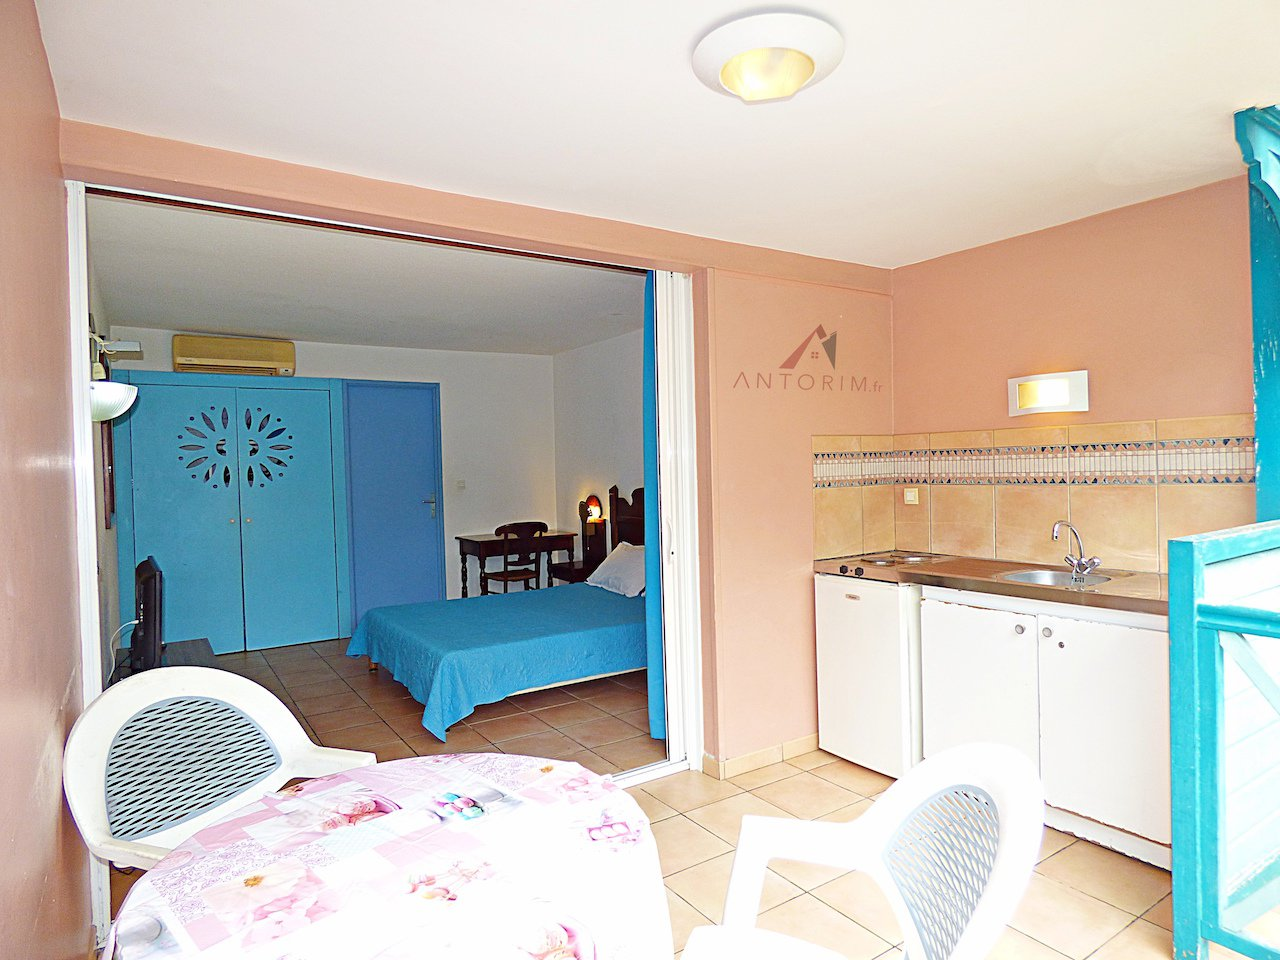 EXCLUSIVITE 2 : SAINTE-ANNE - Superbe Studio - Rez-de-Jardin - Proche Plage